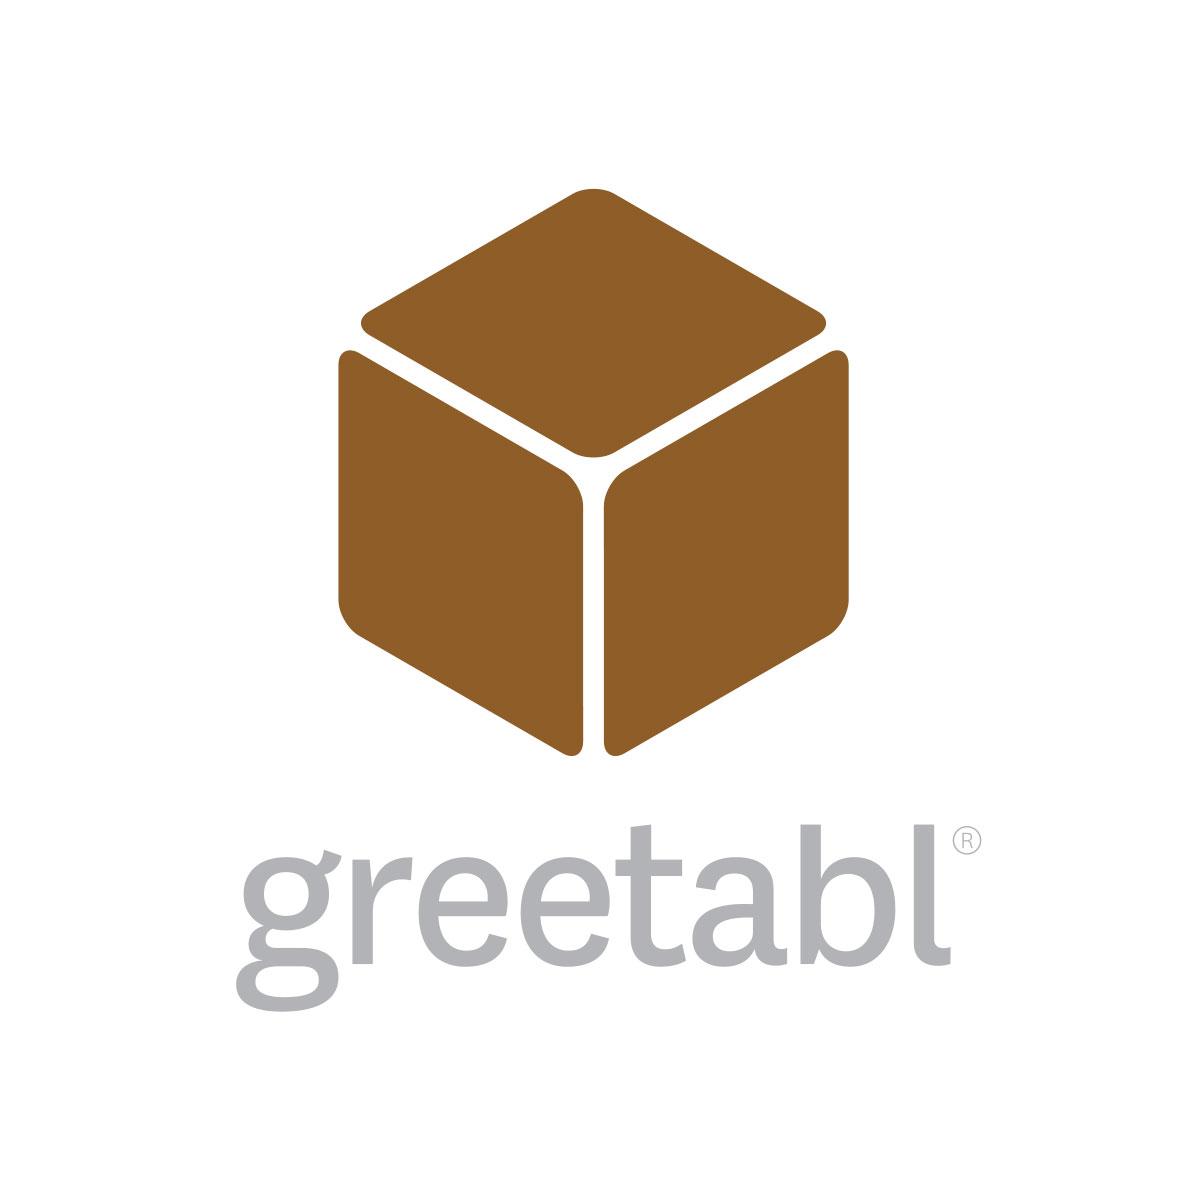 greetabl